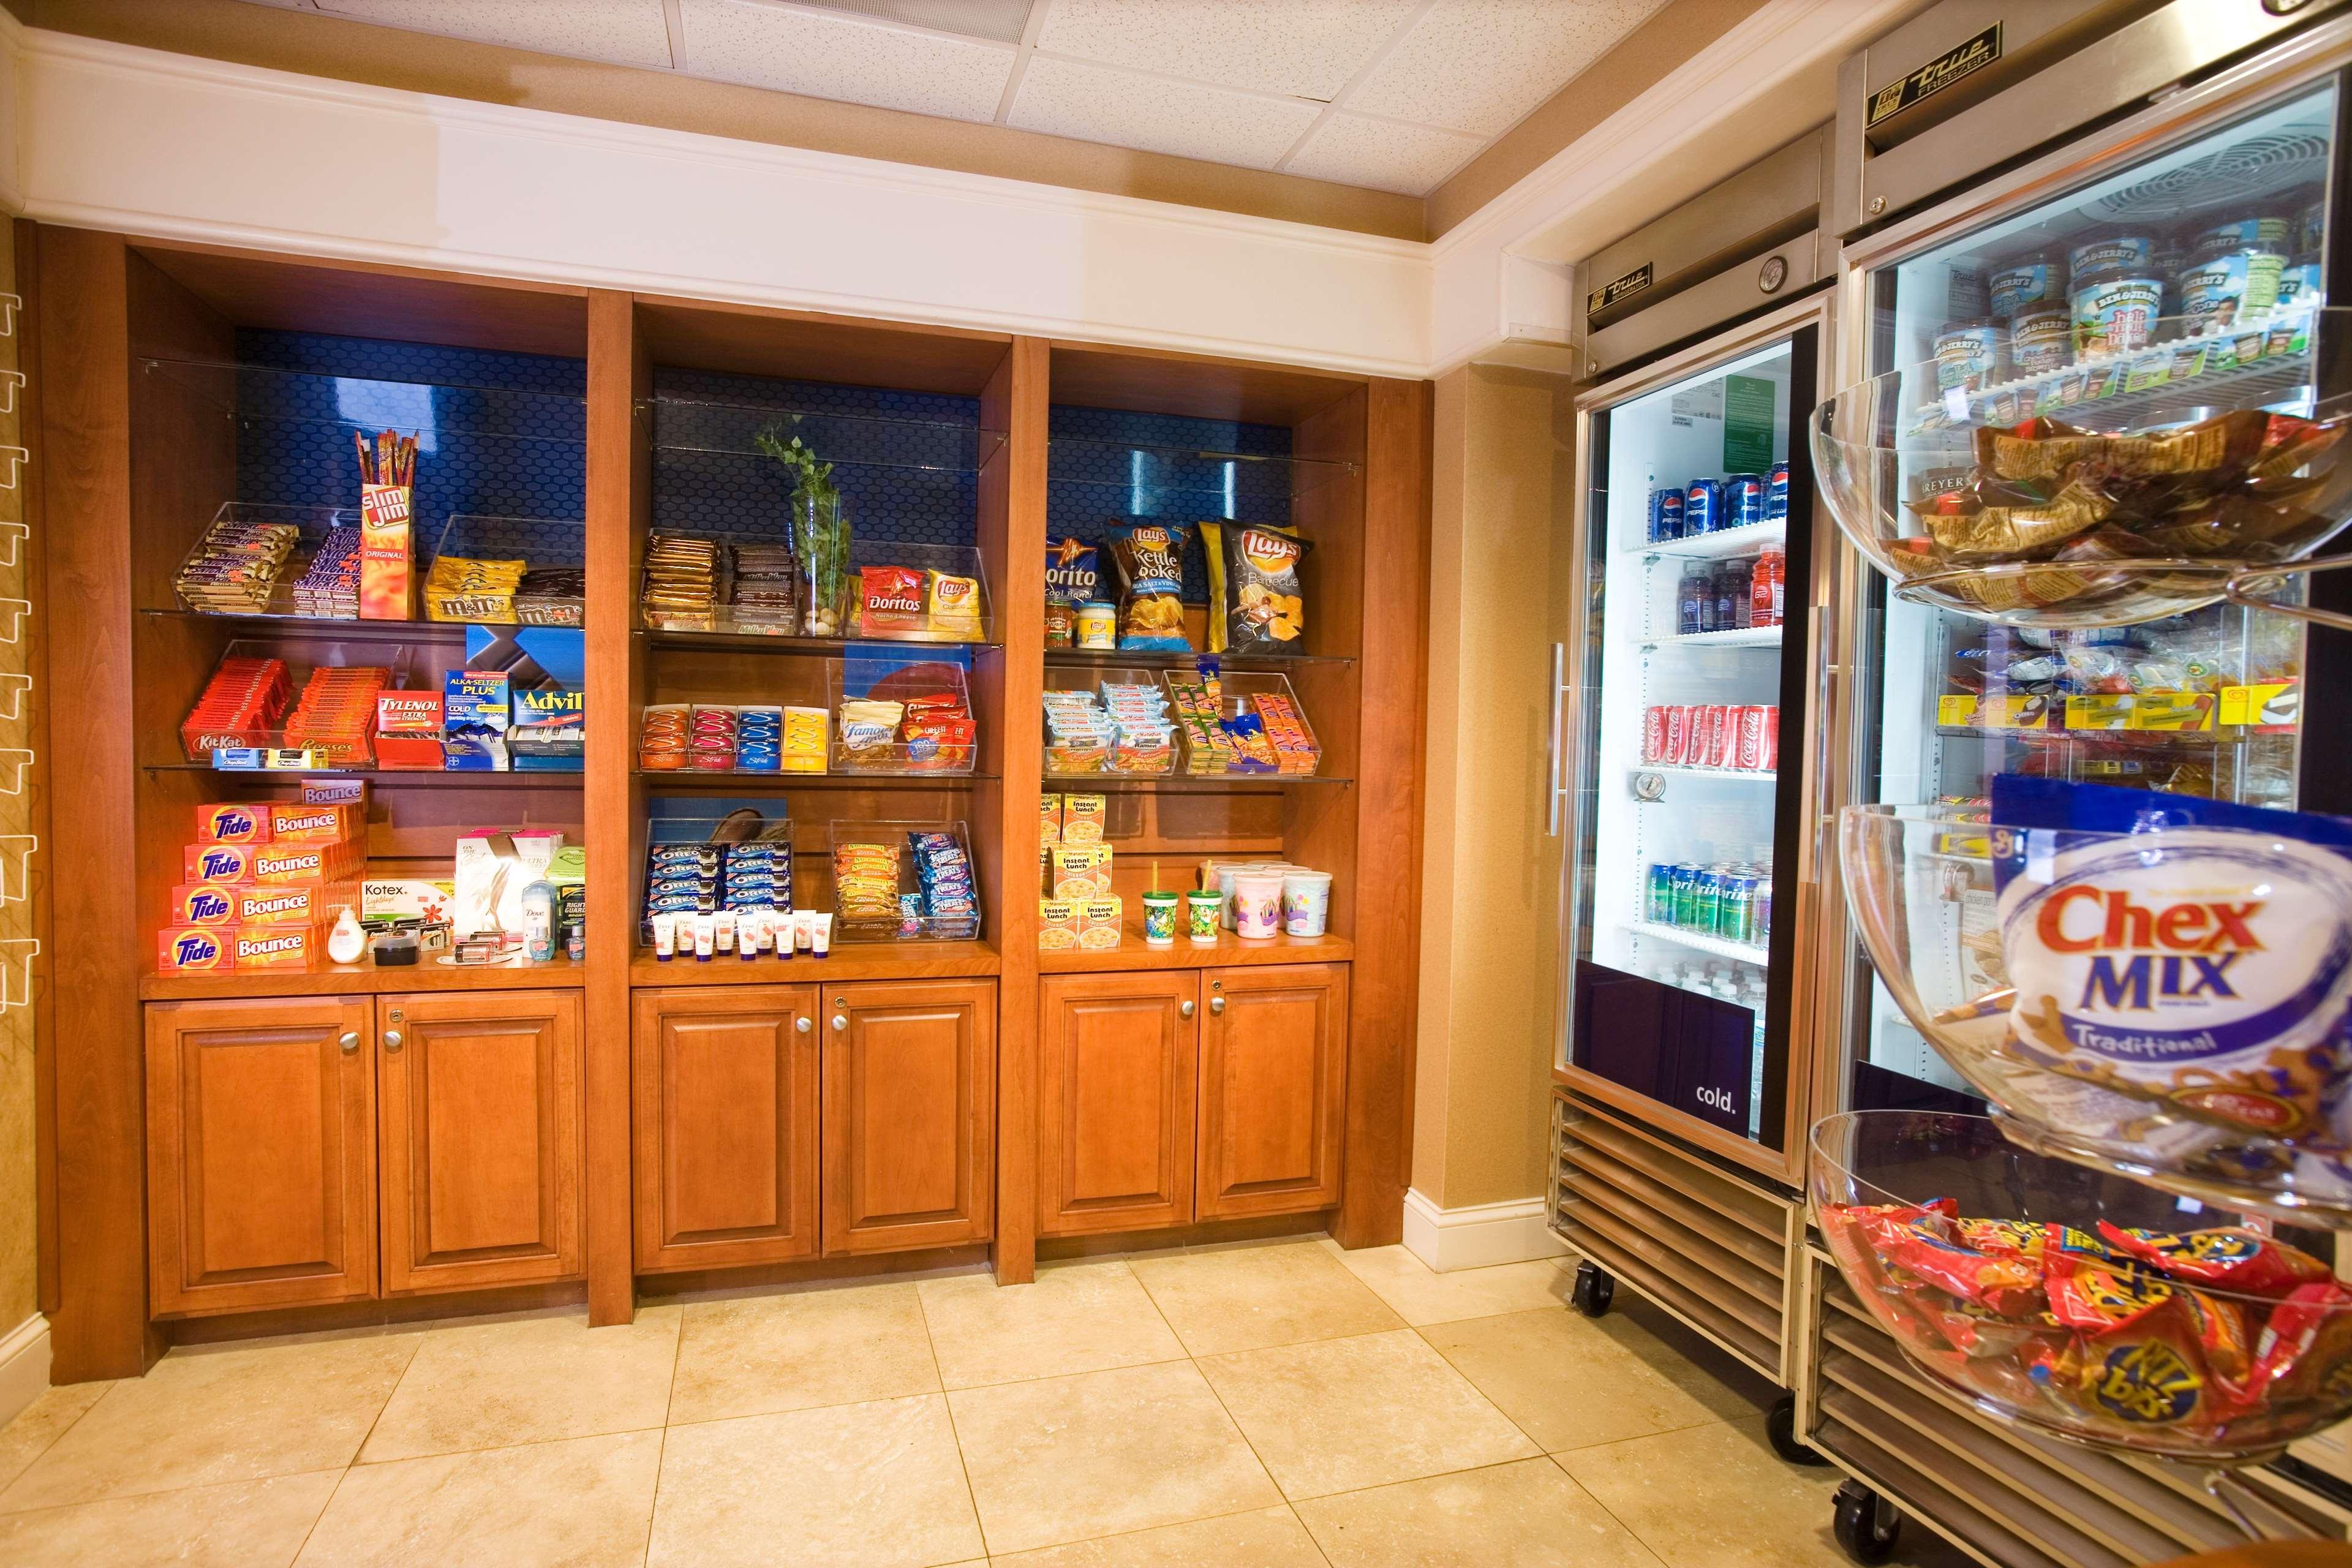 Hampton Inn & Suites Orlando Intl Dr N image 8